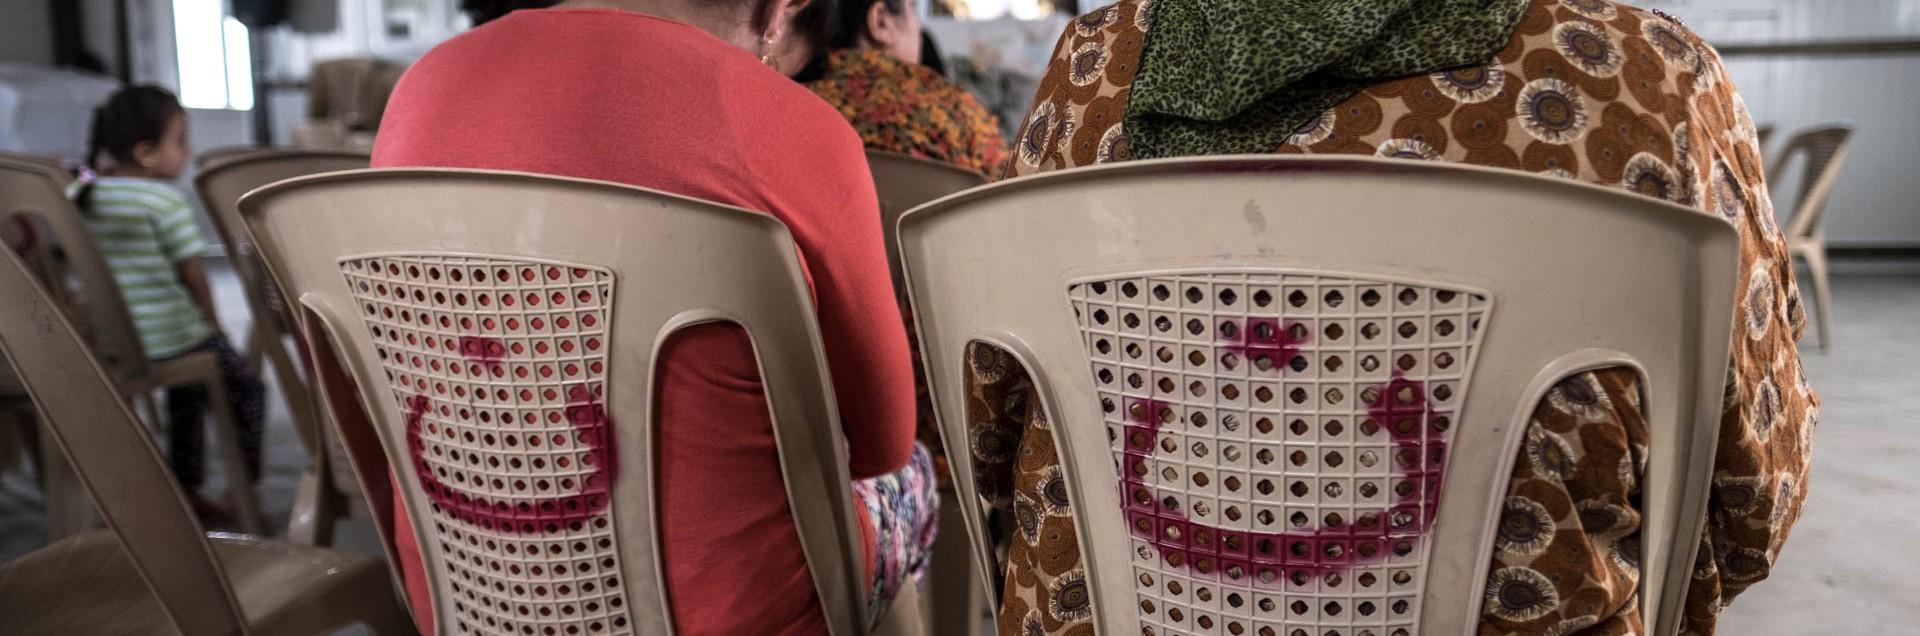 Tra i cristiani iracheni rifiutati dall'Europa